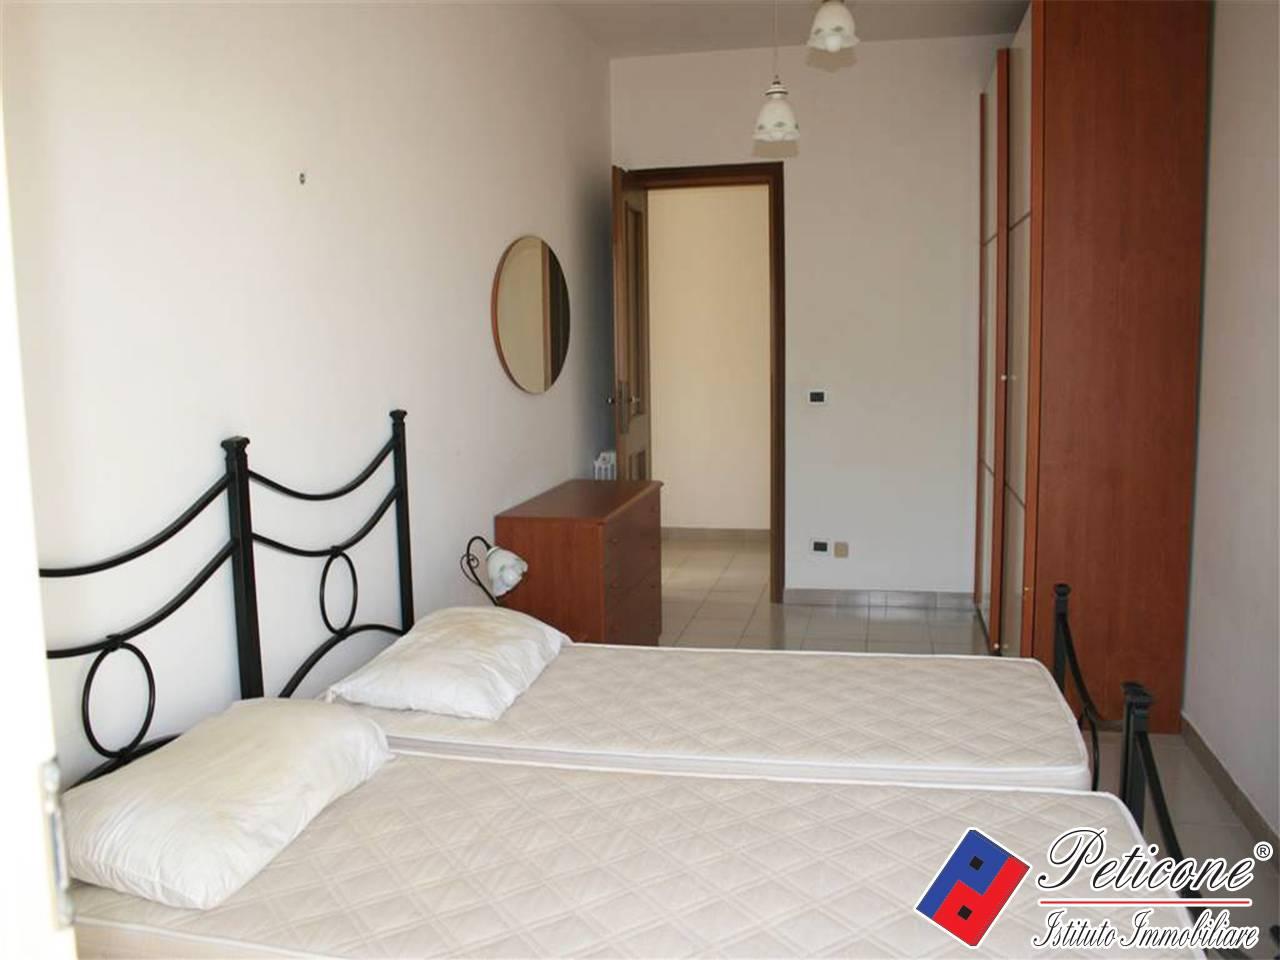 Appartamento in Vendita a Gaeta: 4 locali, 91 mq - Foto 7